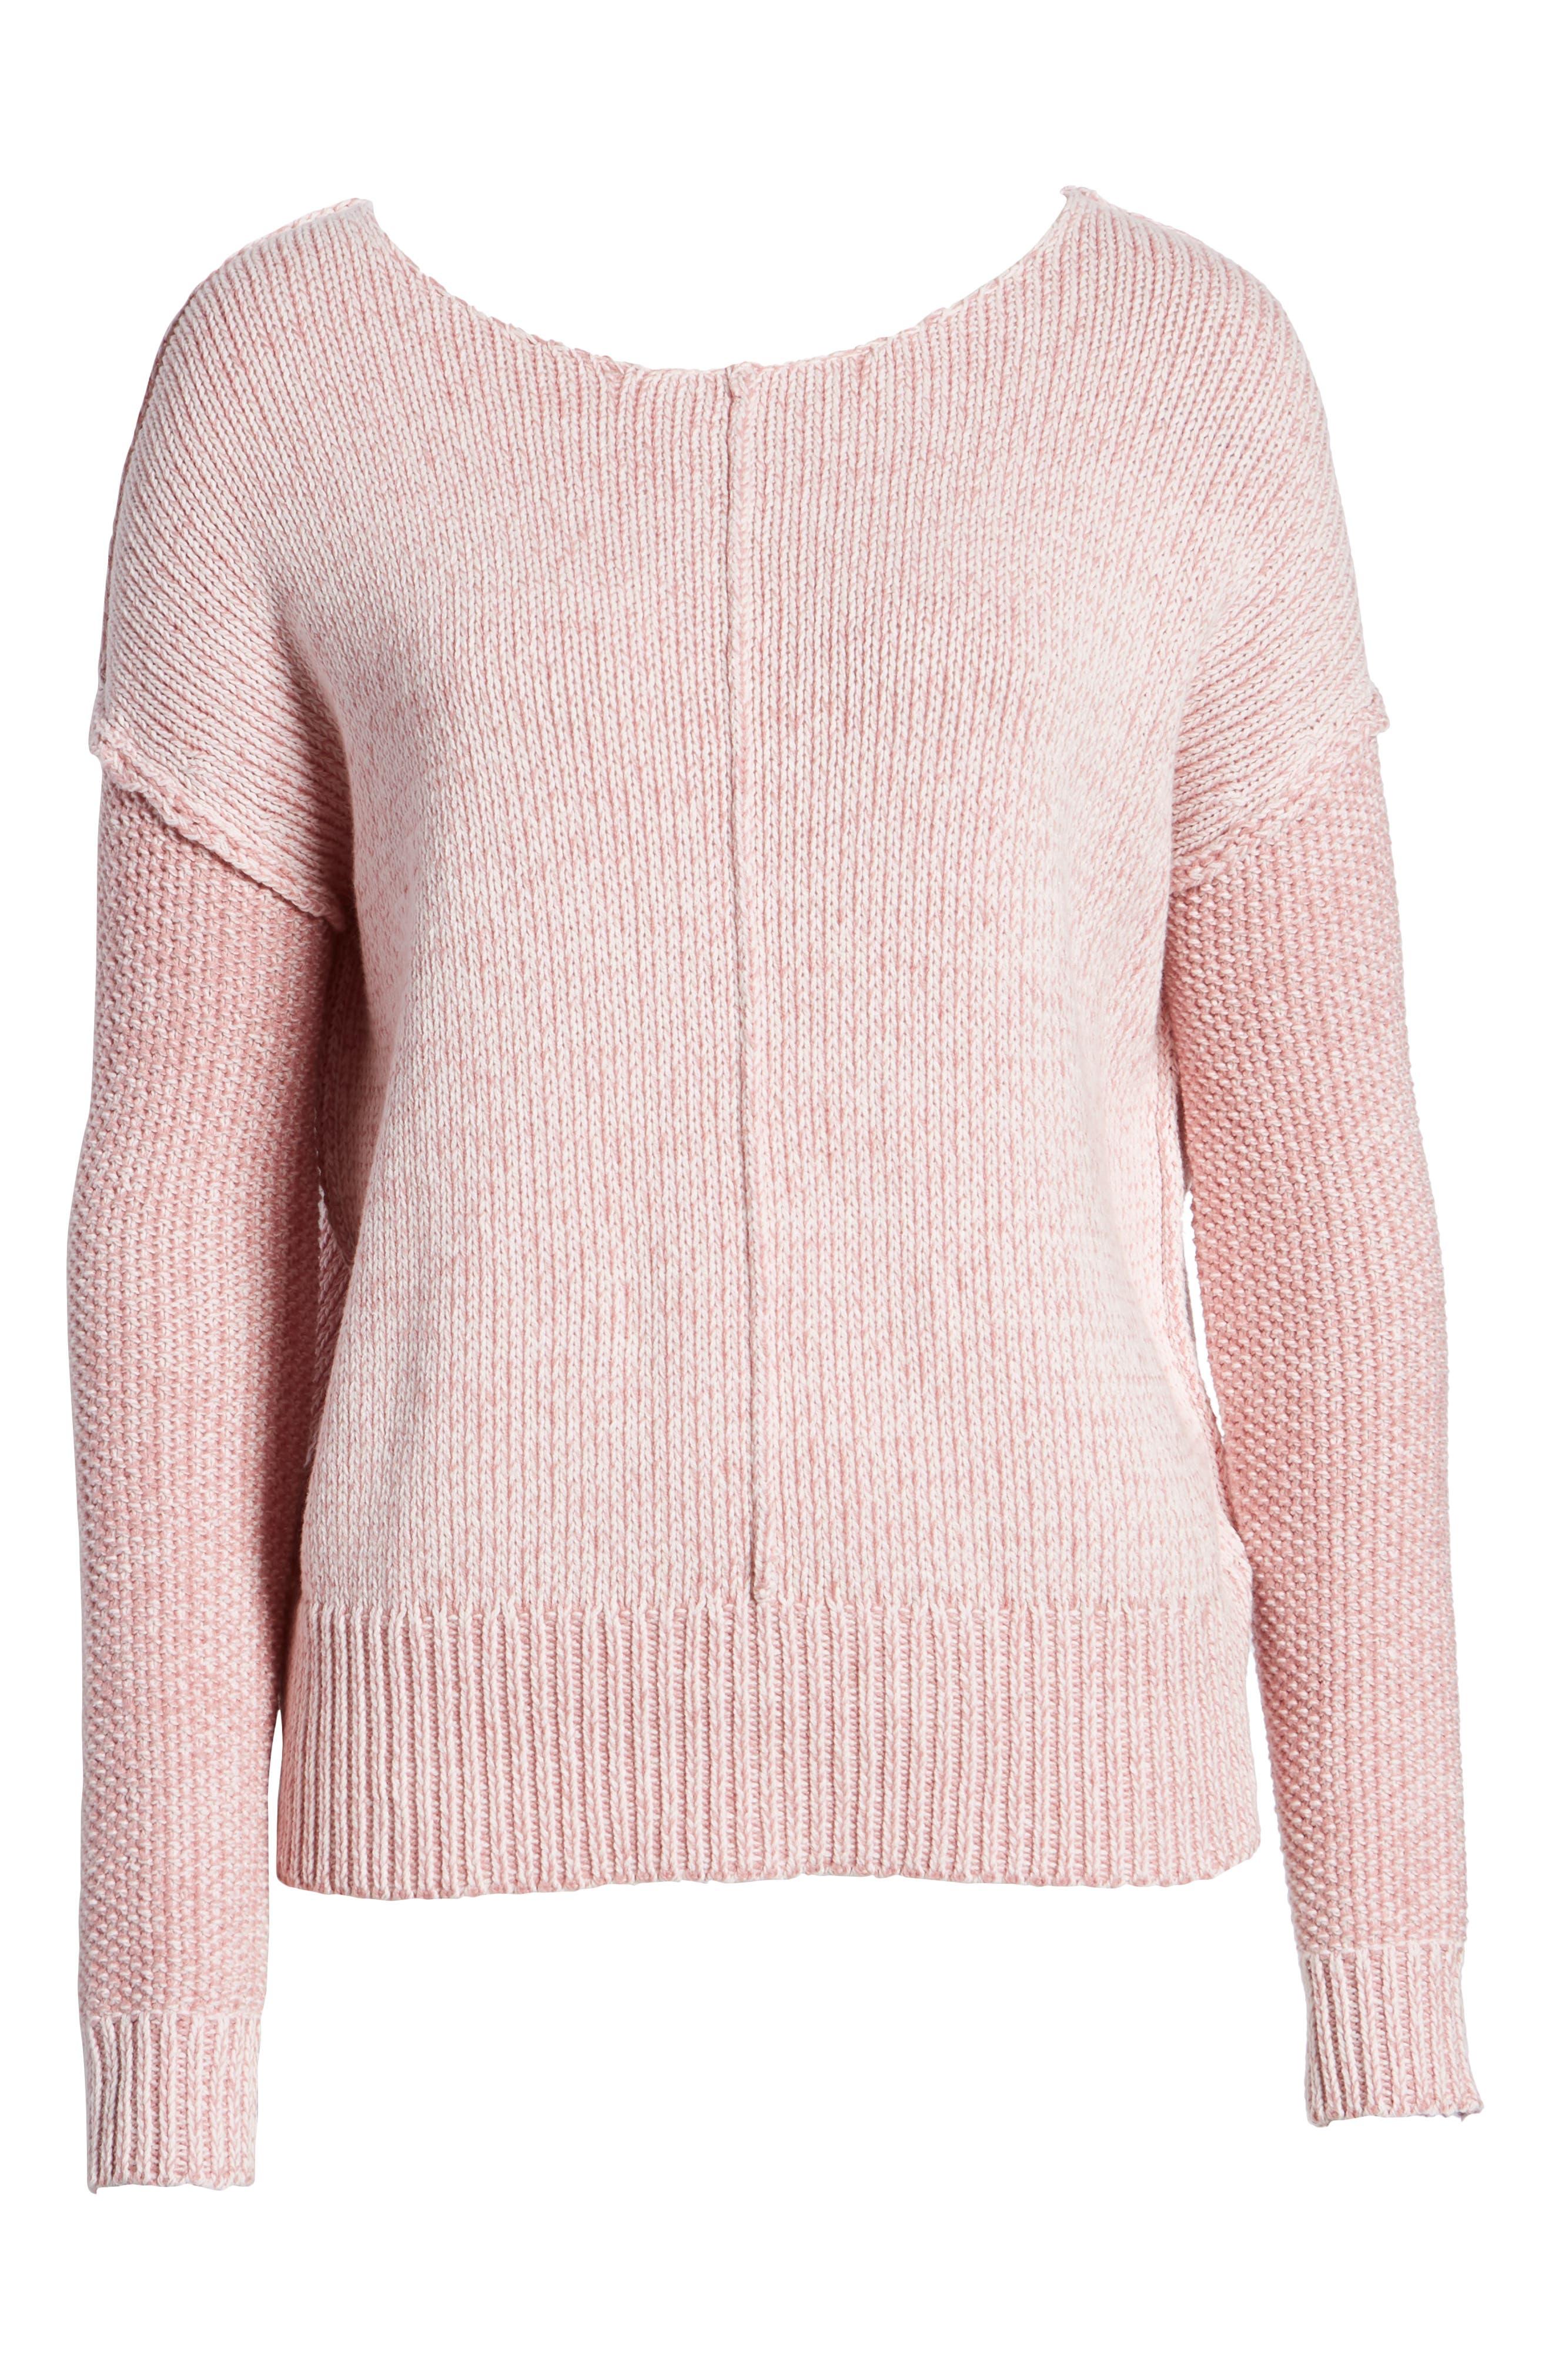 Lola Reversible Twist Sweater,                             Alternate thumbnail 19, color,